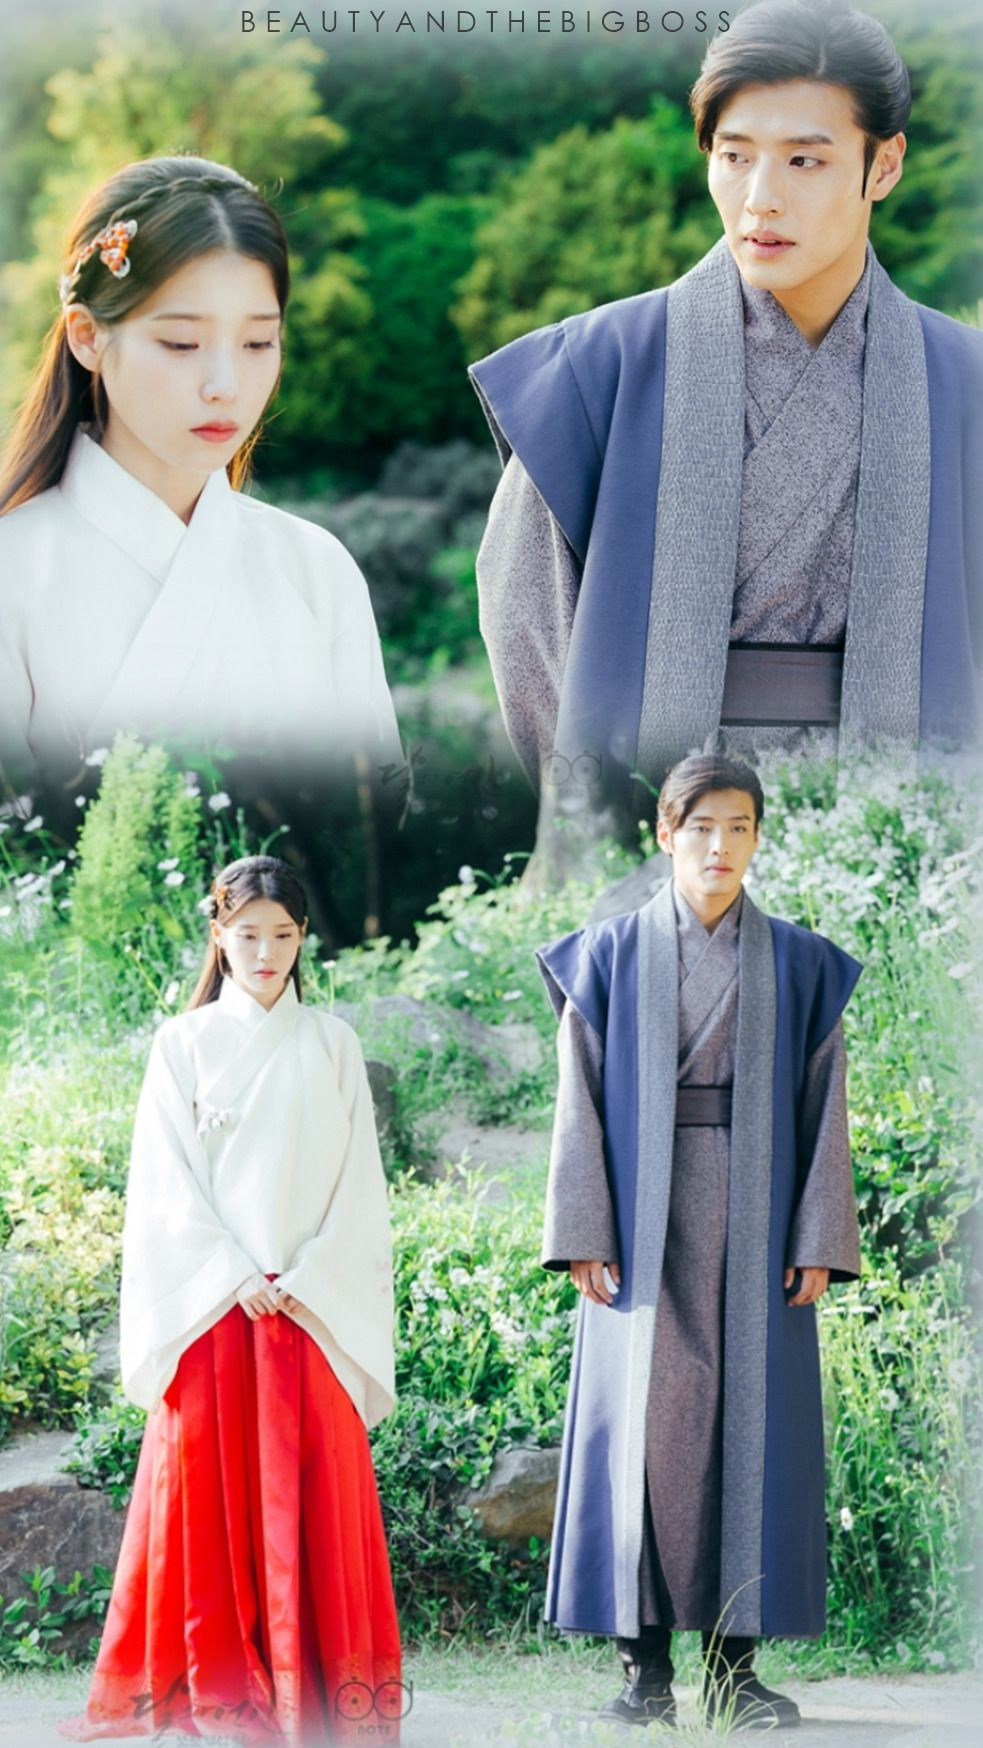 Scarlet heart ryeo-moon lovers IU/ kang ha neul / wallpapers